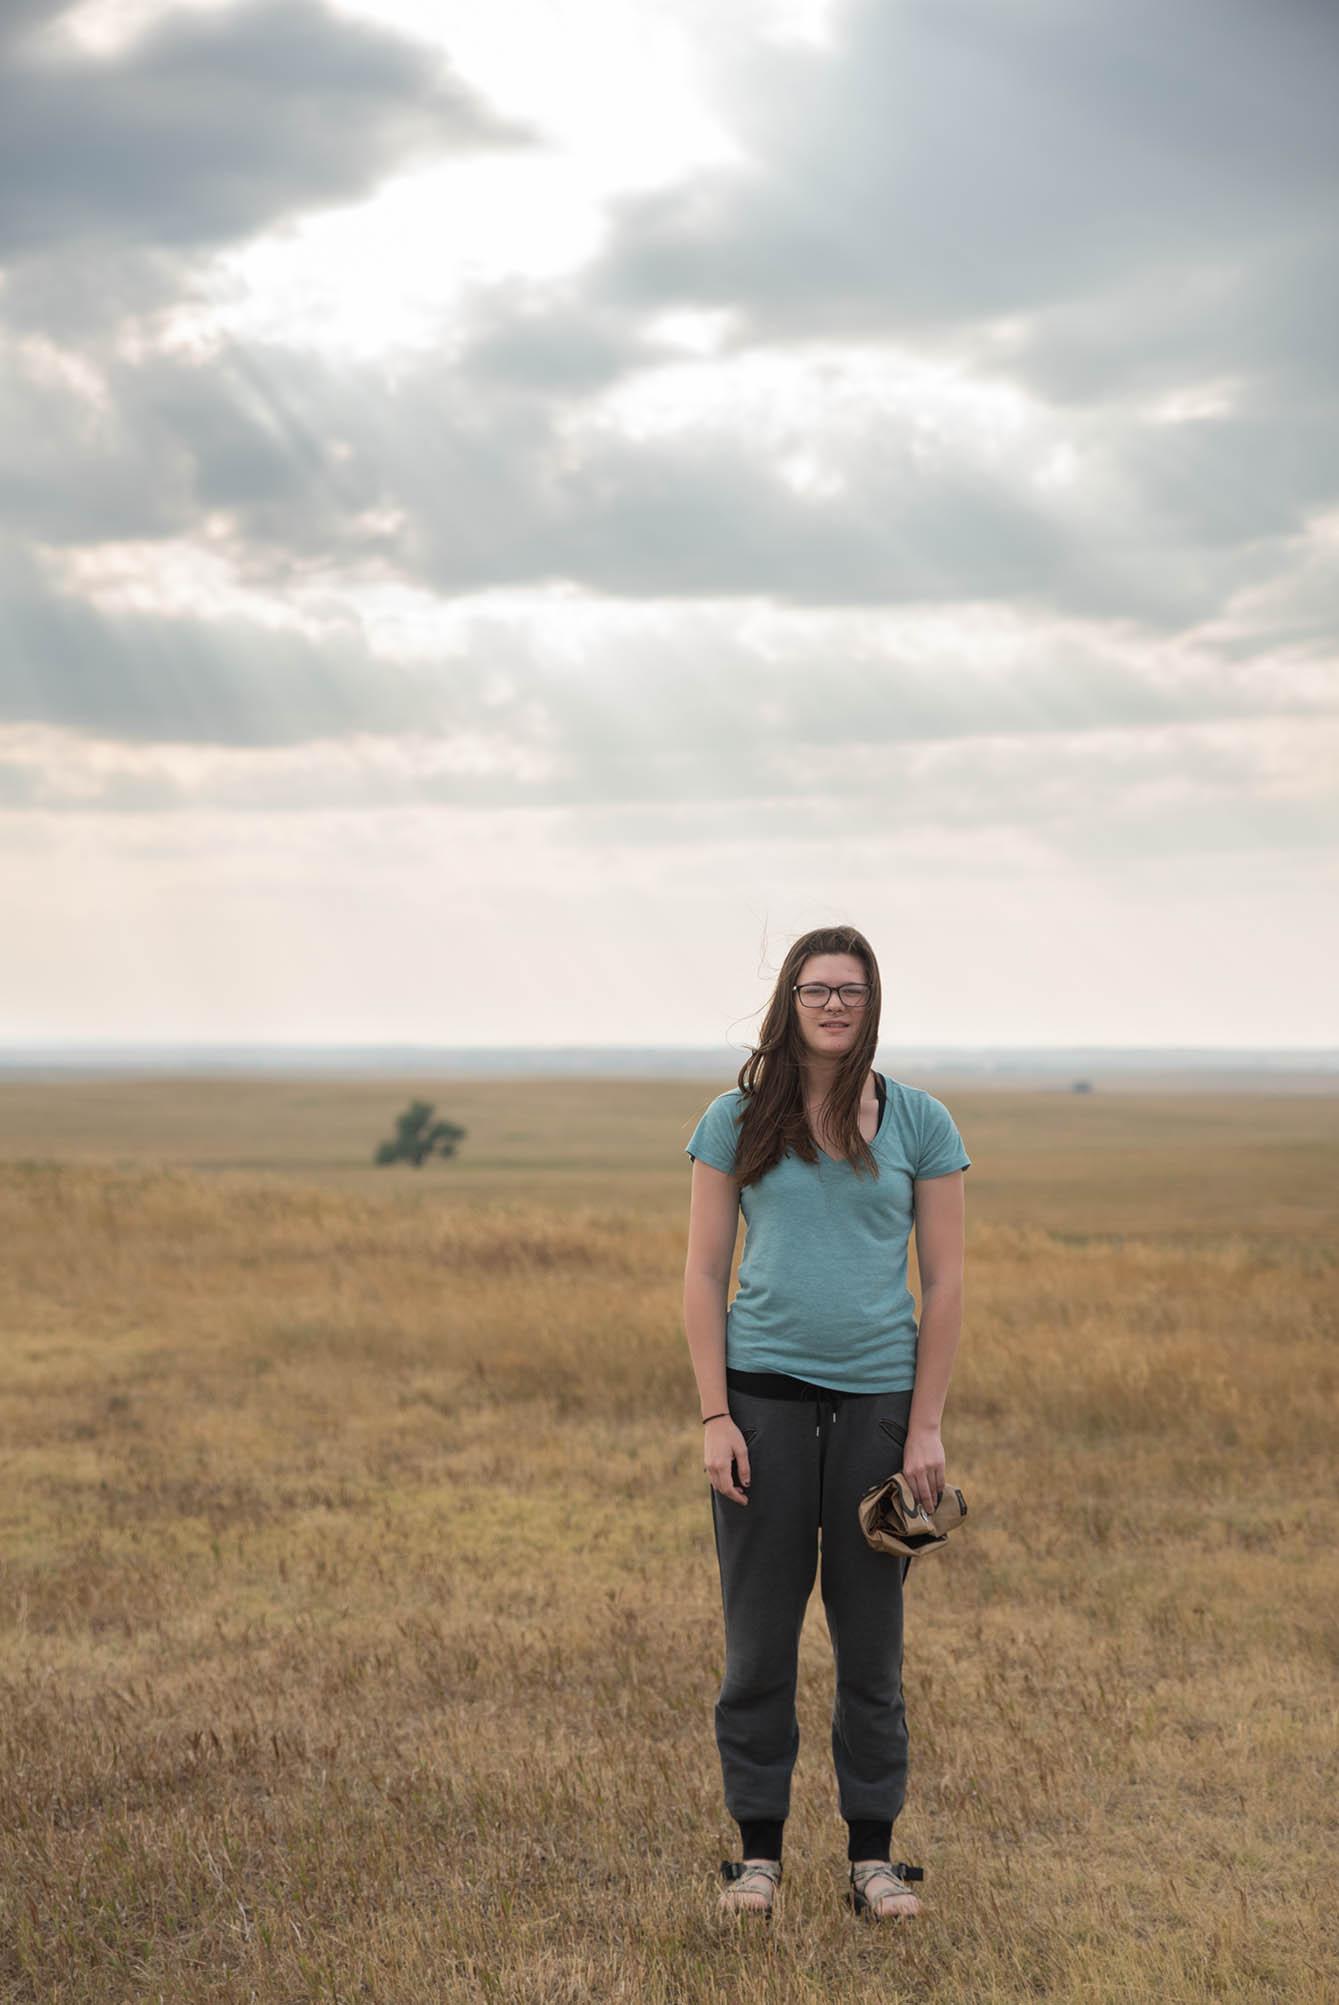 kate_at_the_buffalo_grassland_reserve_SD_1.jpg